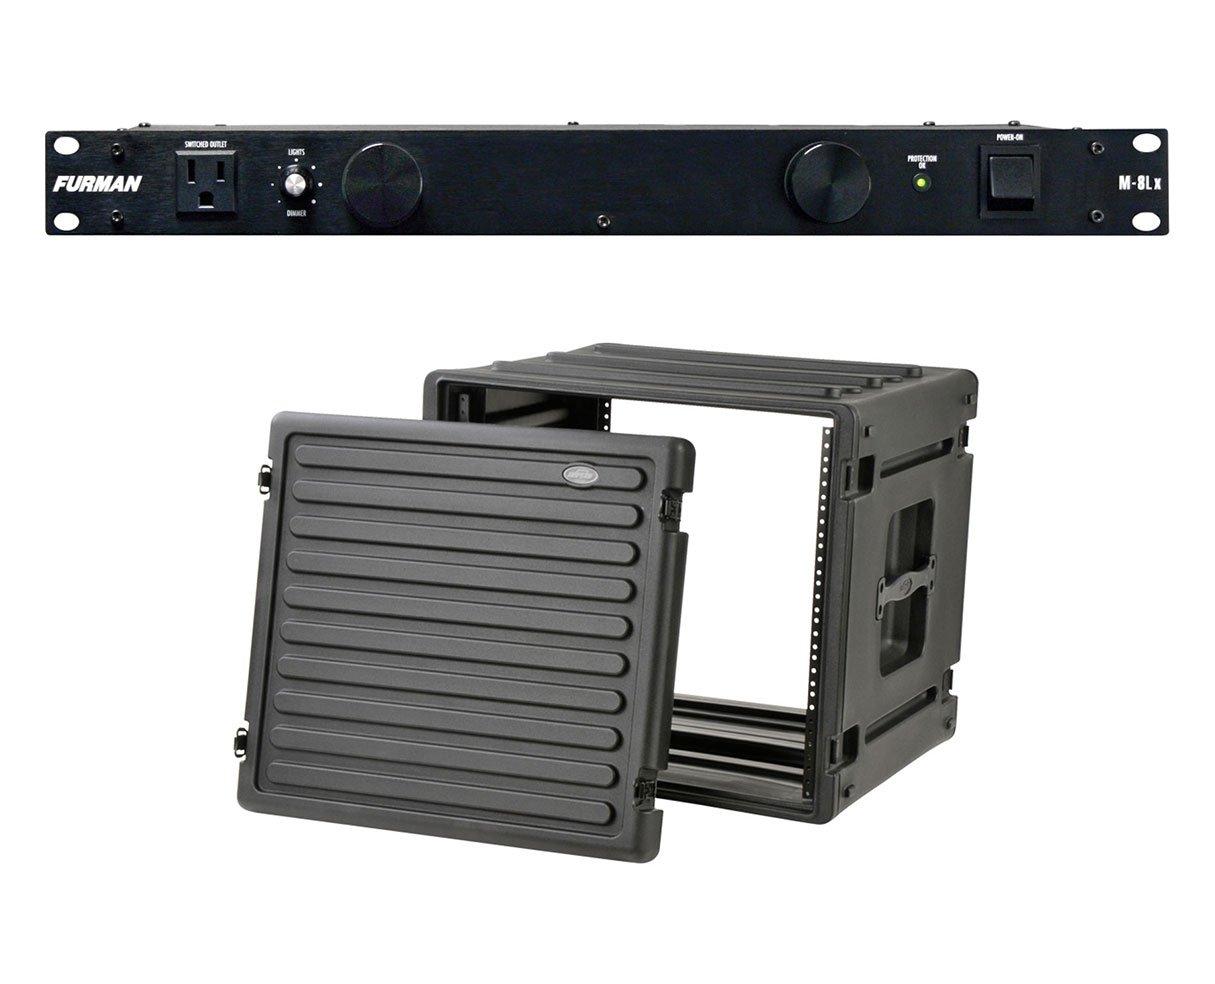 Furman M-8Lx 15 Amp Power Conditioner + SKB 1SKB-R10U Roto Molded 10U Rack